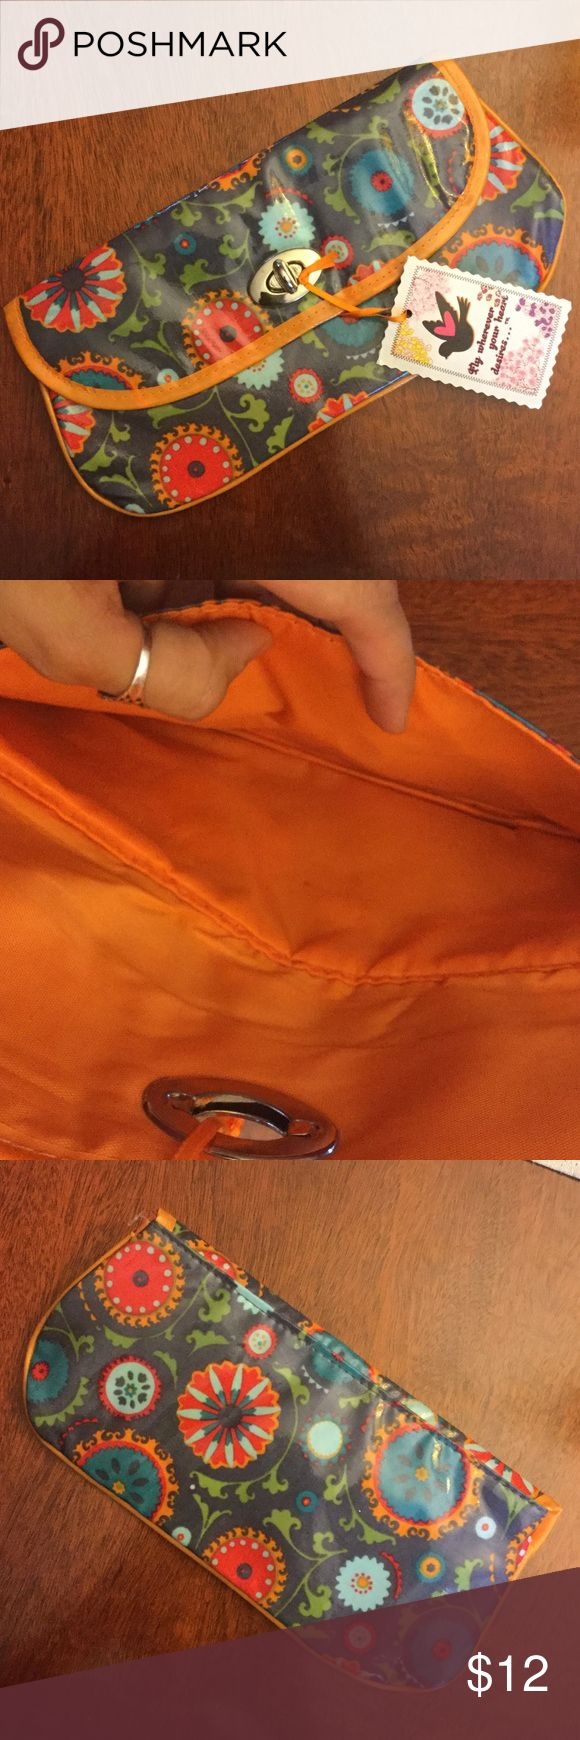 Cute floral makeup bag ! Floral navy and orange makeup bag